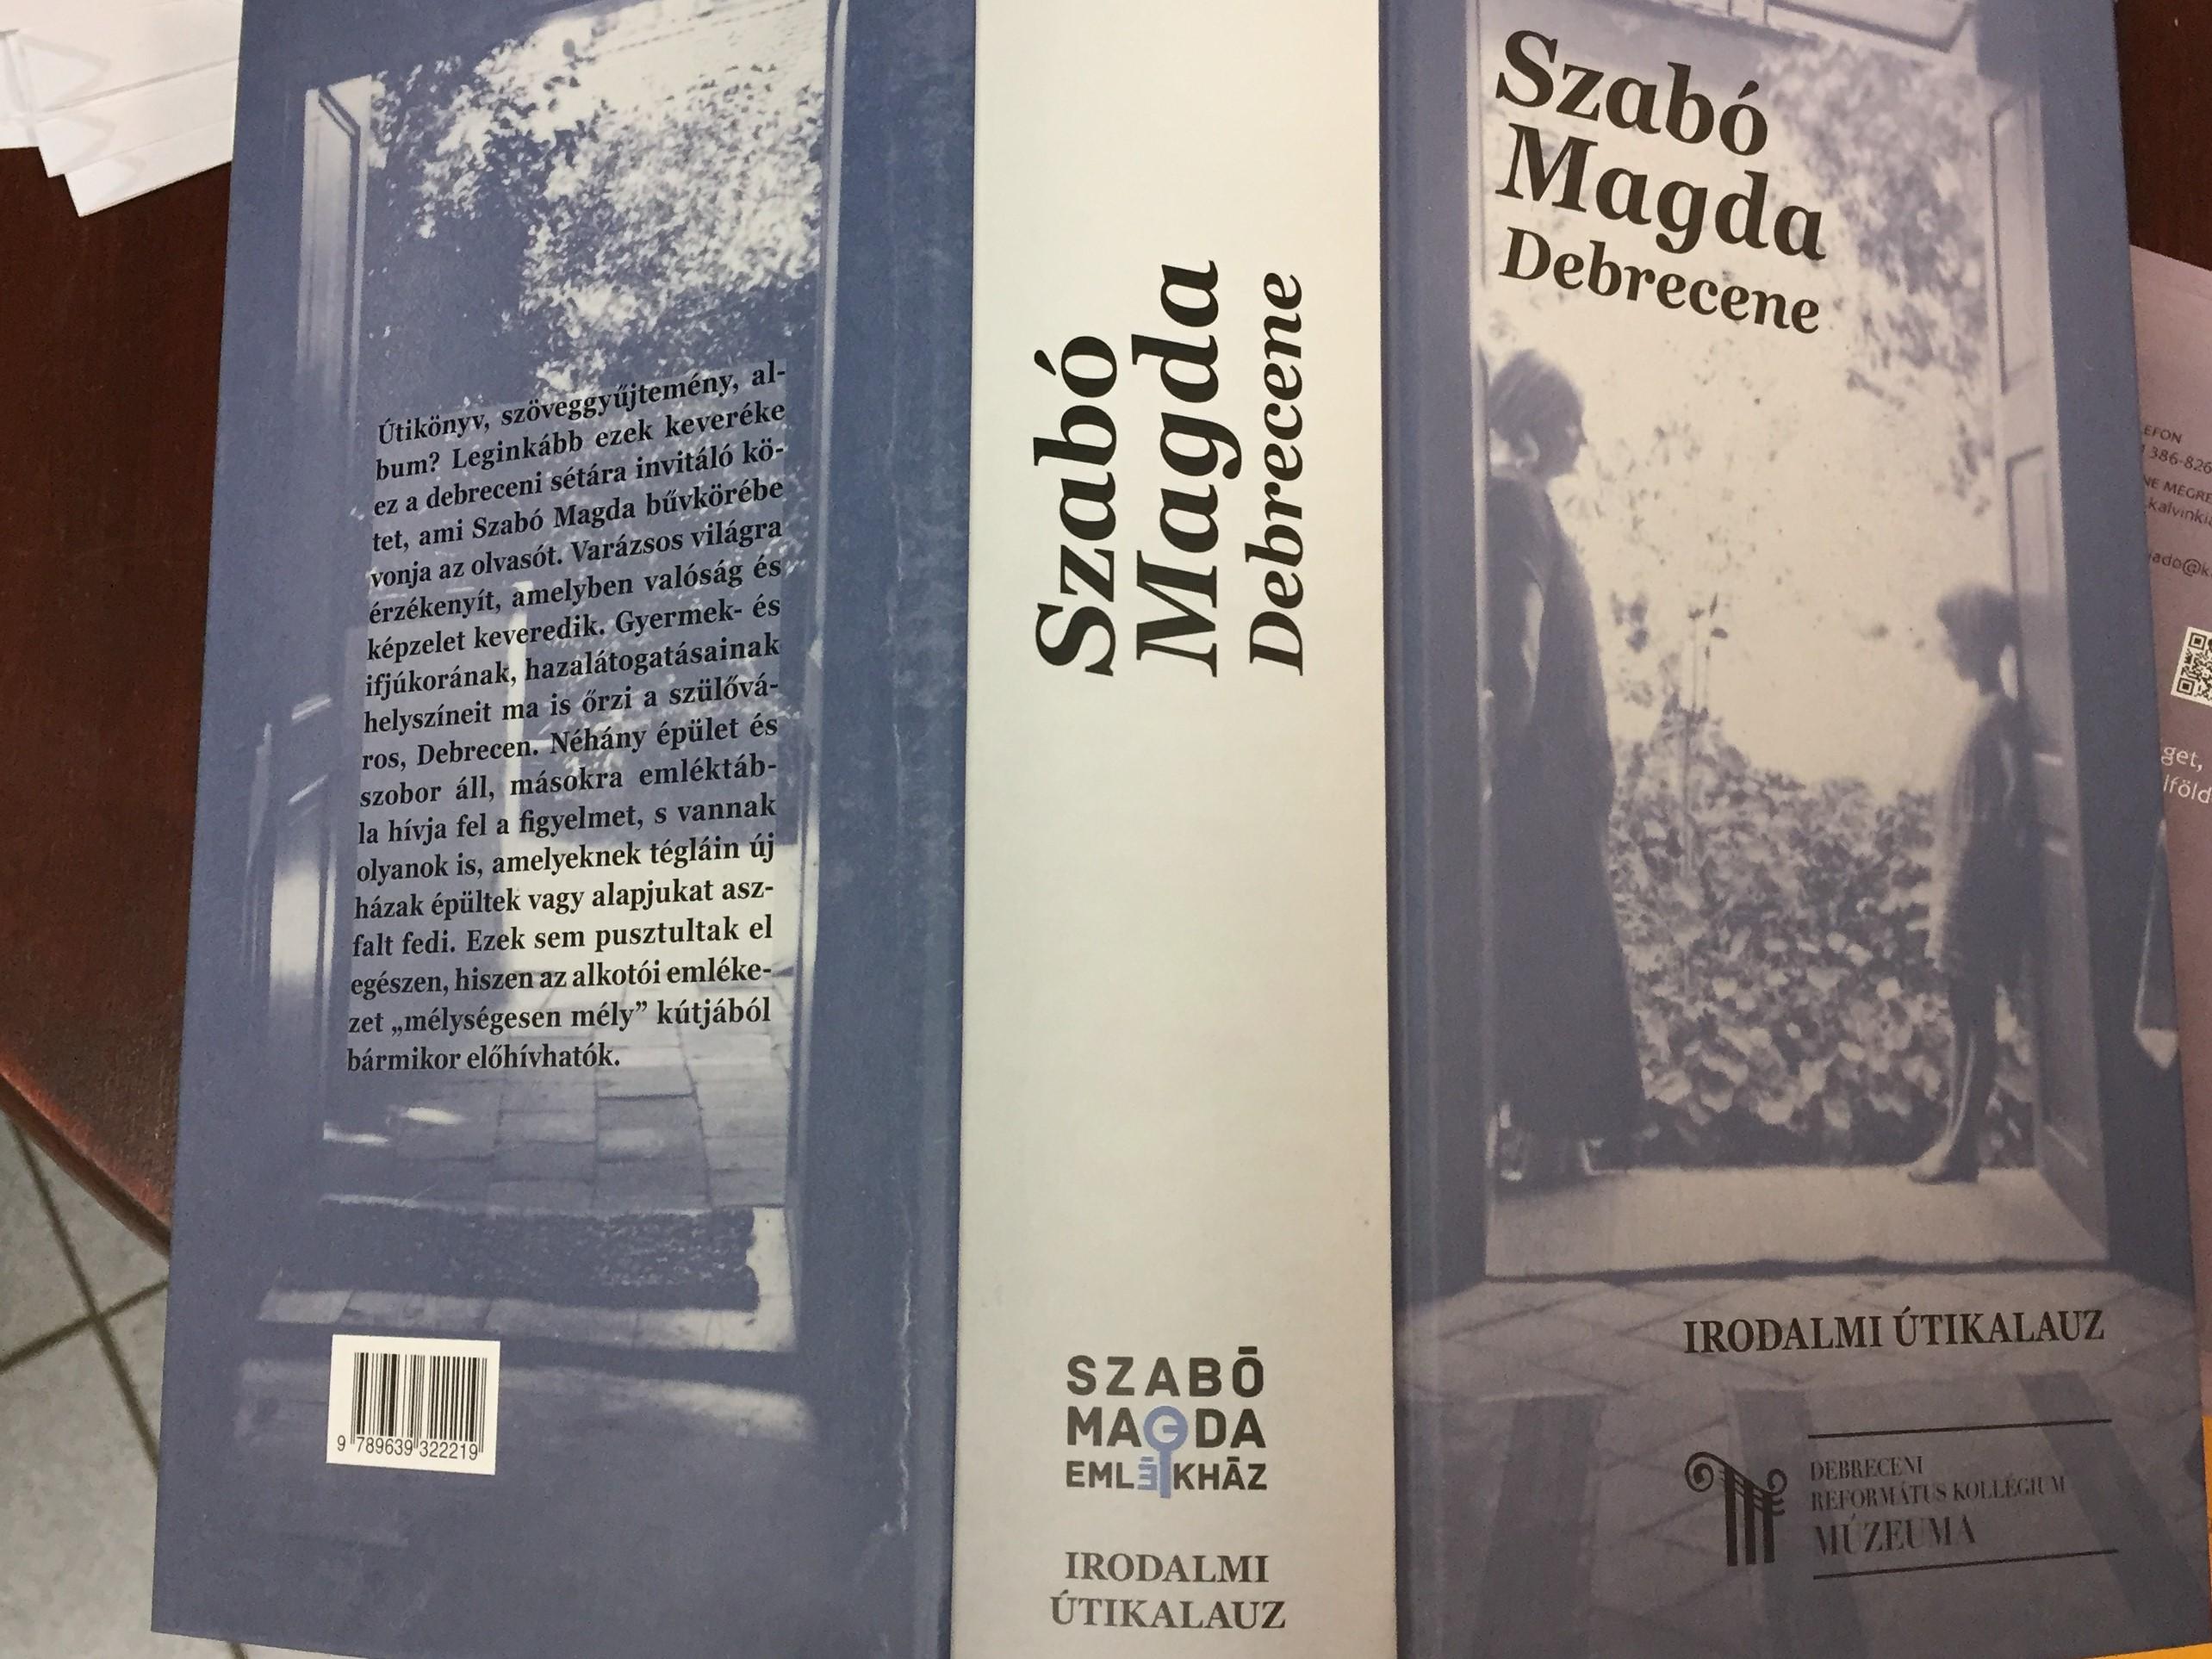 szab-magda-debrecene-irodalmi-tikalauz-hungarian-language-literary-guide-to-the-city-of-debrecen-debreceni-reform-tus-koll-gium-m-zeuma-hardcover-2018-14-.jpg